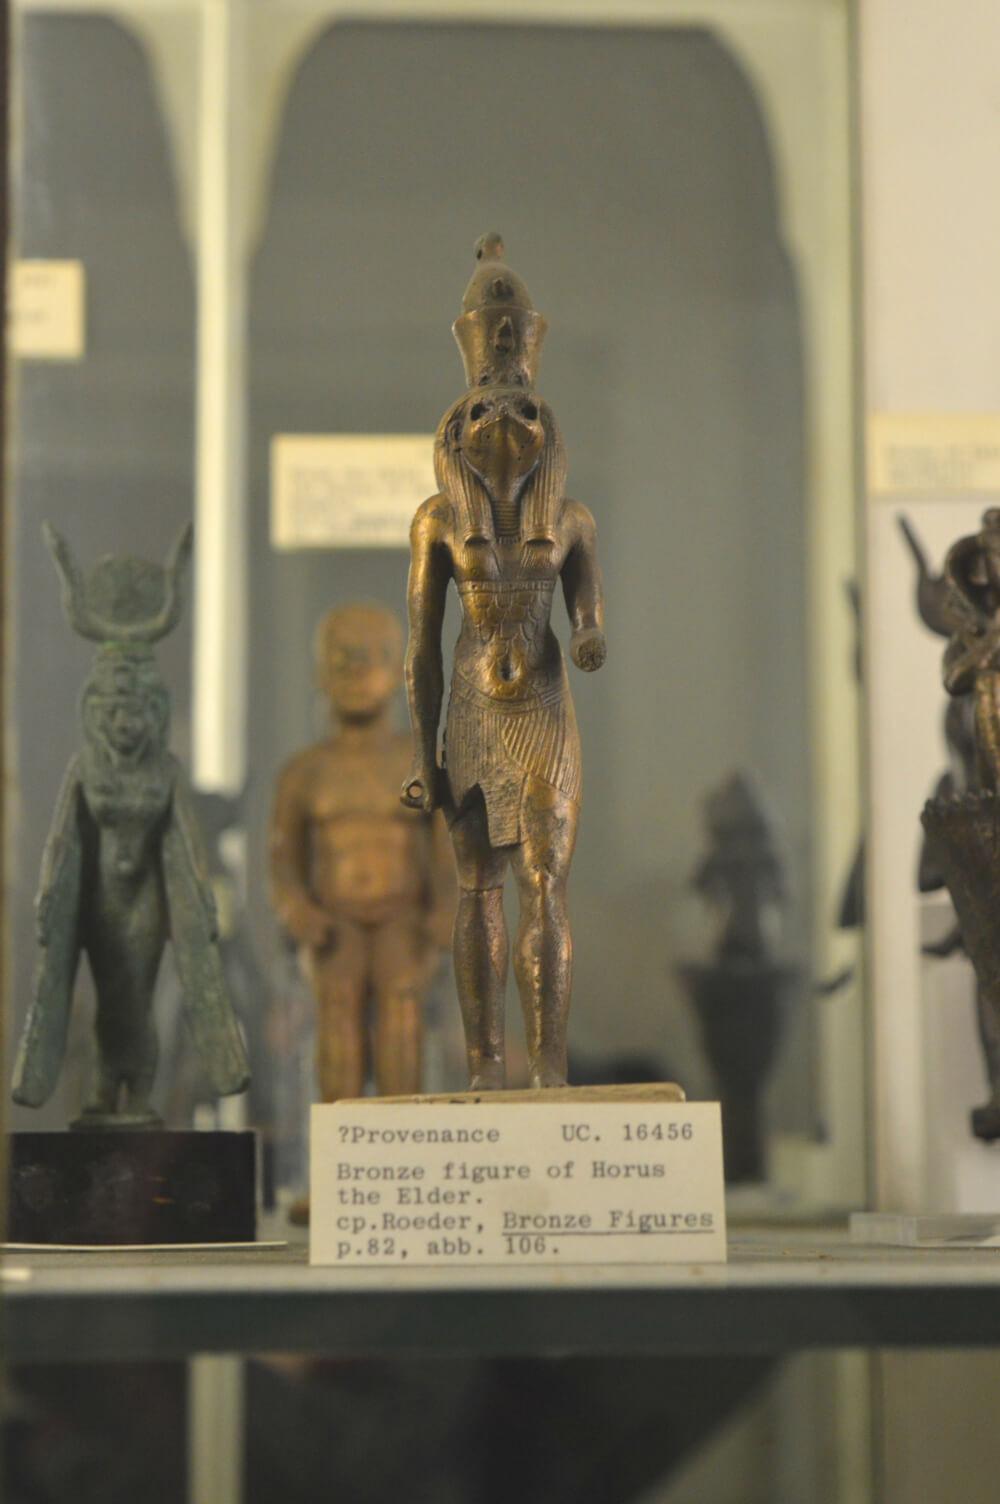 Petrie Museum, UCL, London